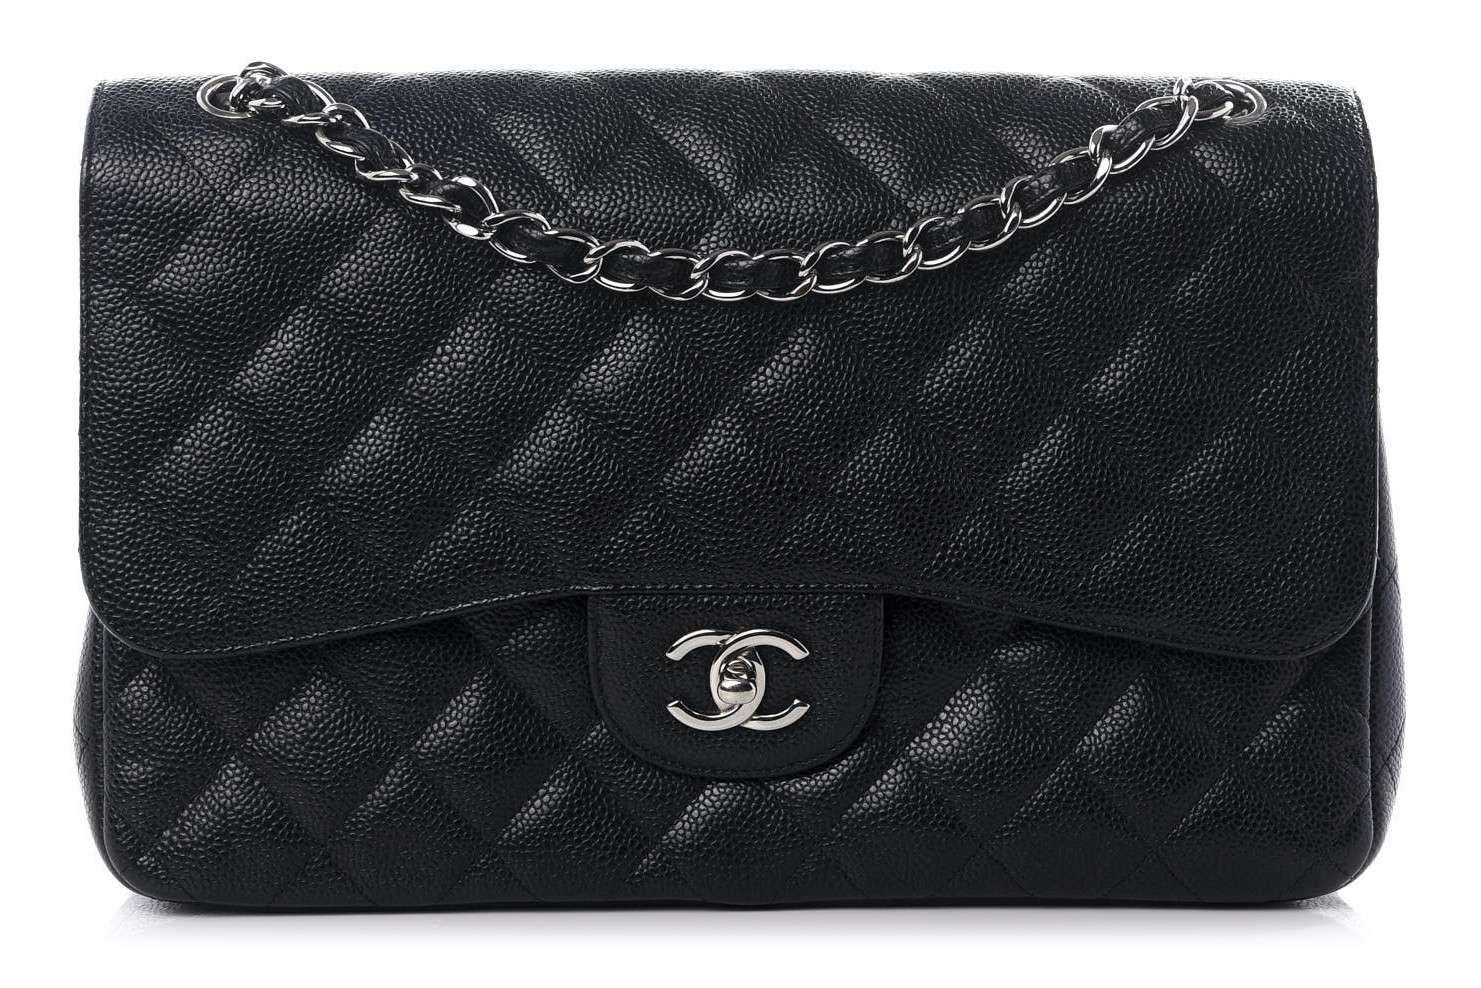 Chanel Caviar Jumbo Classic Flap Black